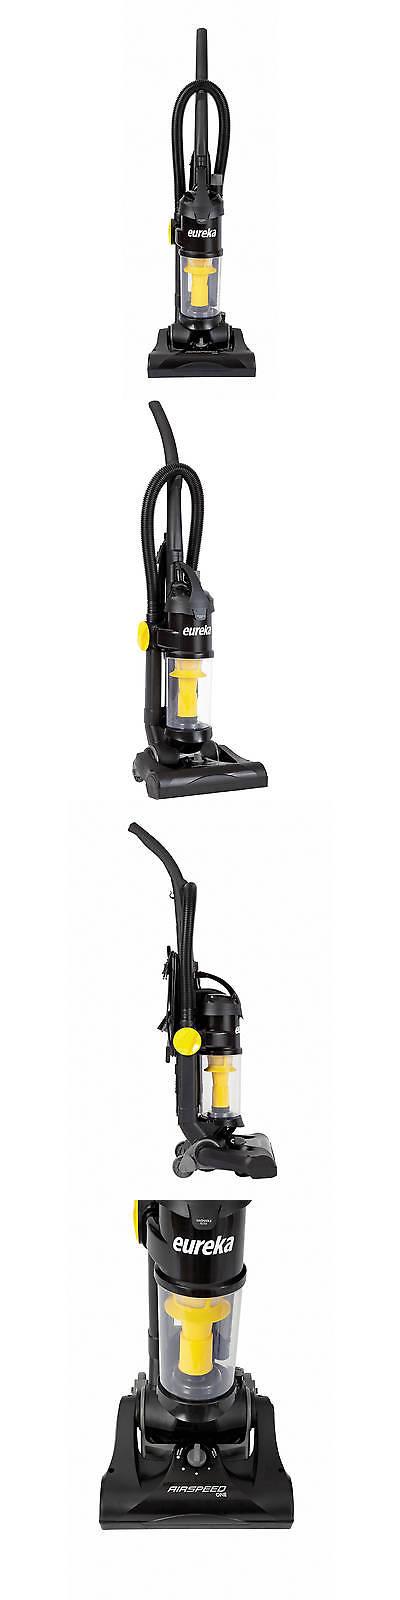 Vacuum Cleaners 20614 Eureka Airspeed One Bagless Upright Vacuum